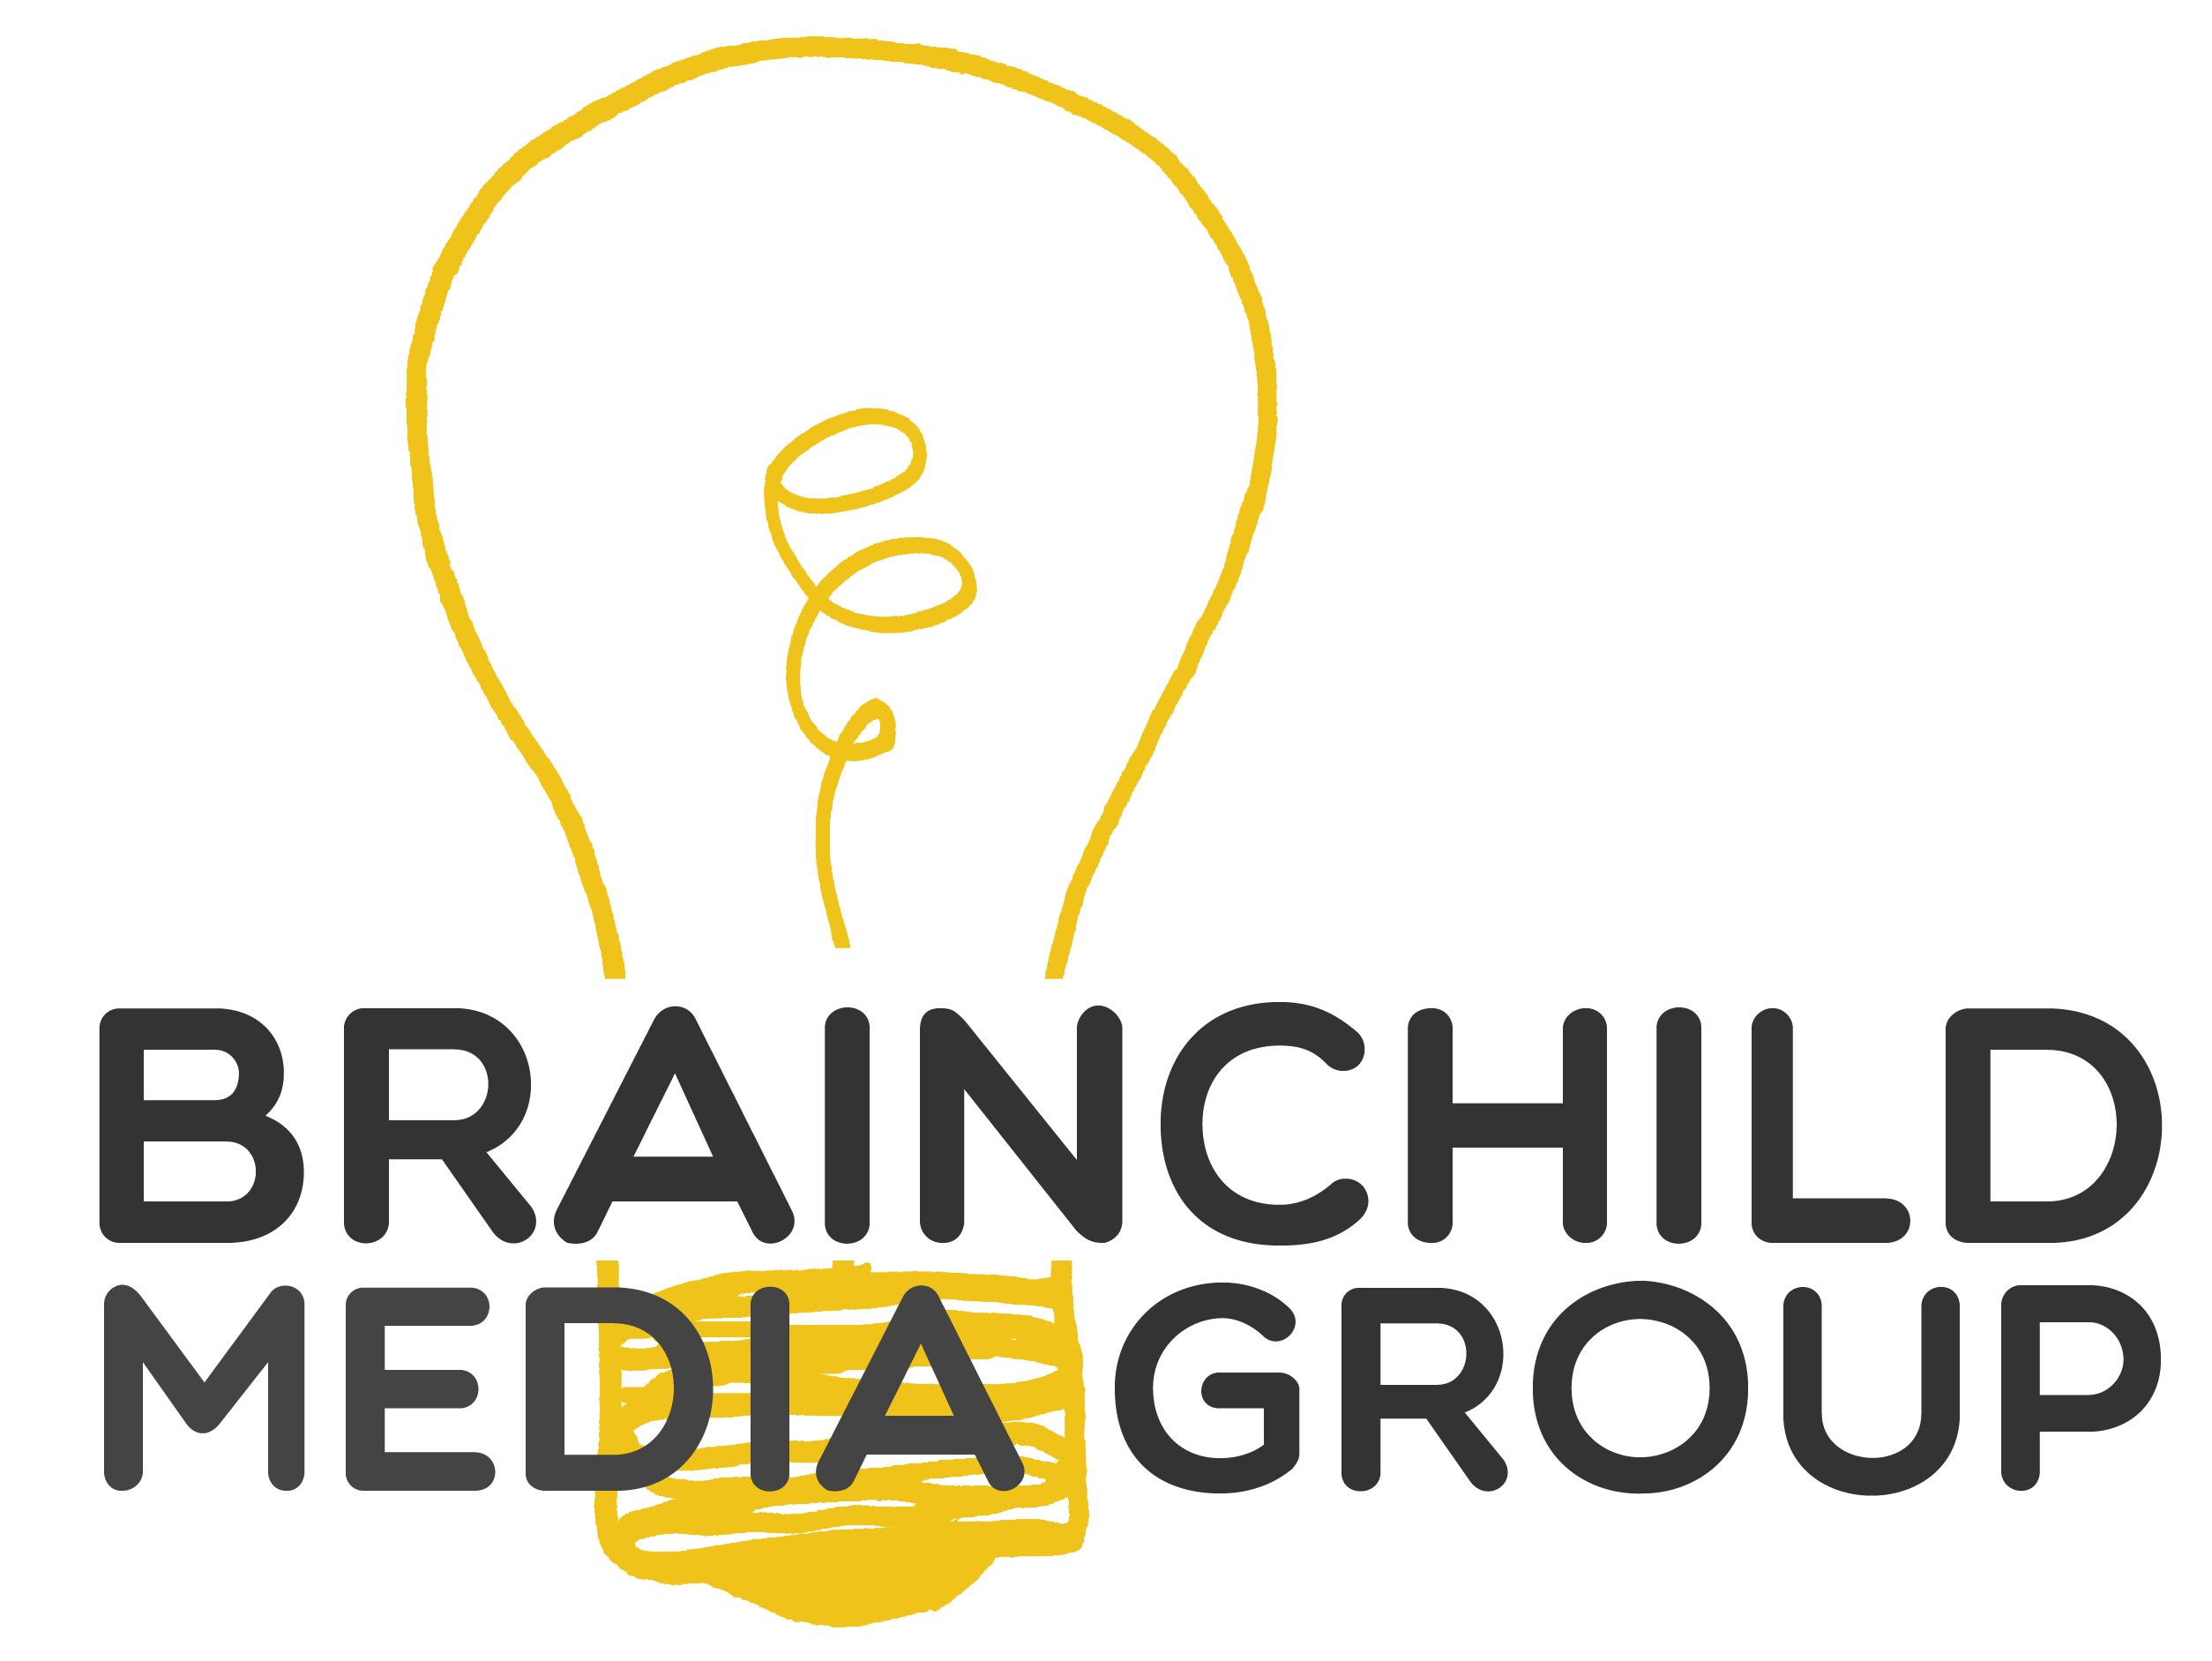 Brainchild Media Group